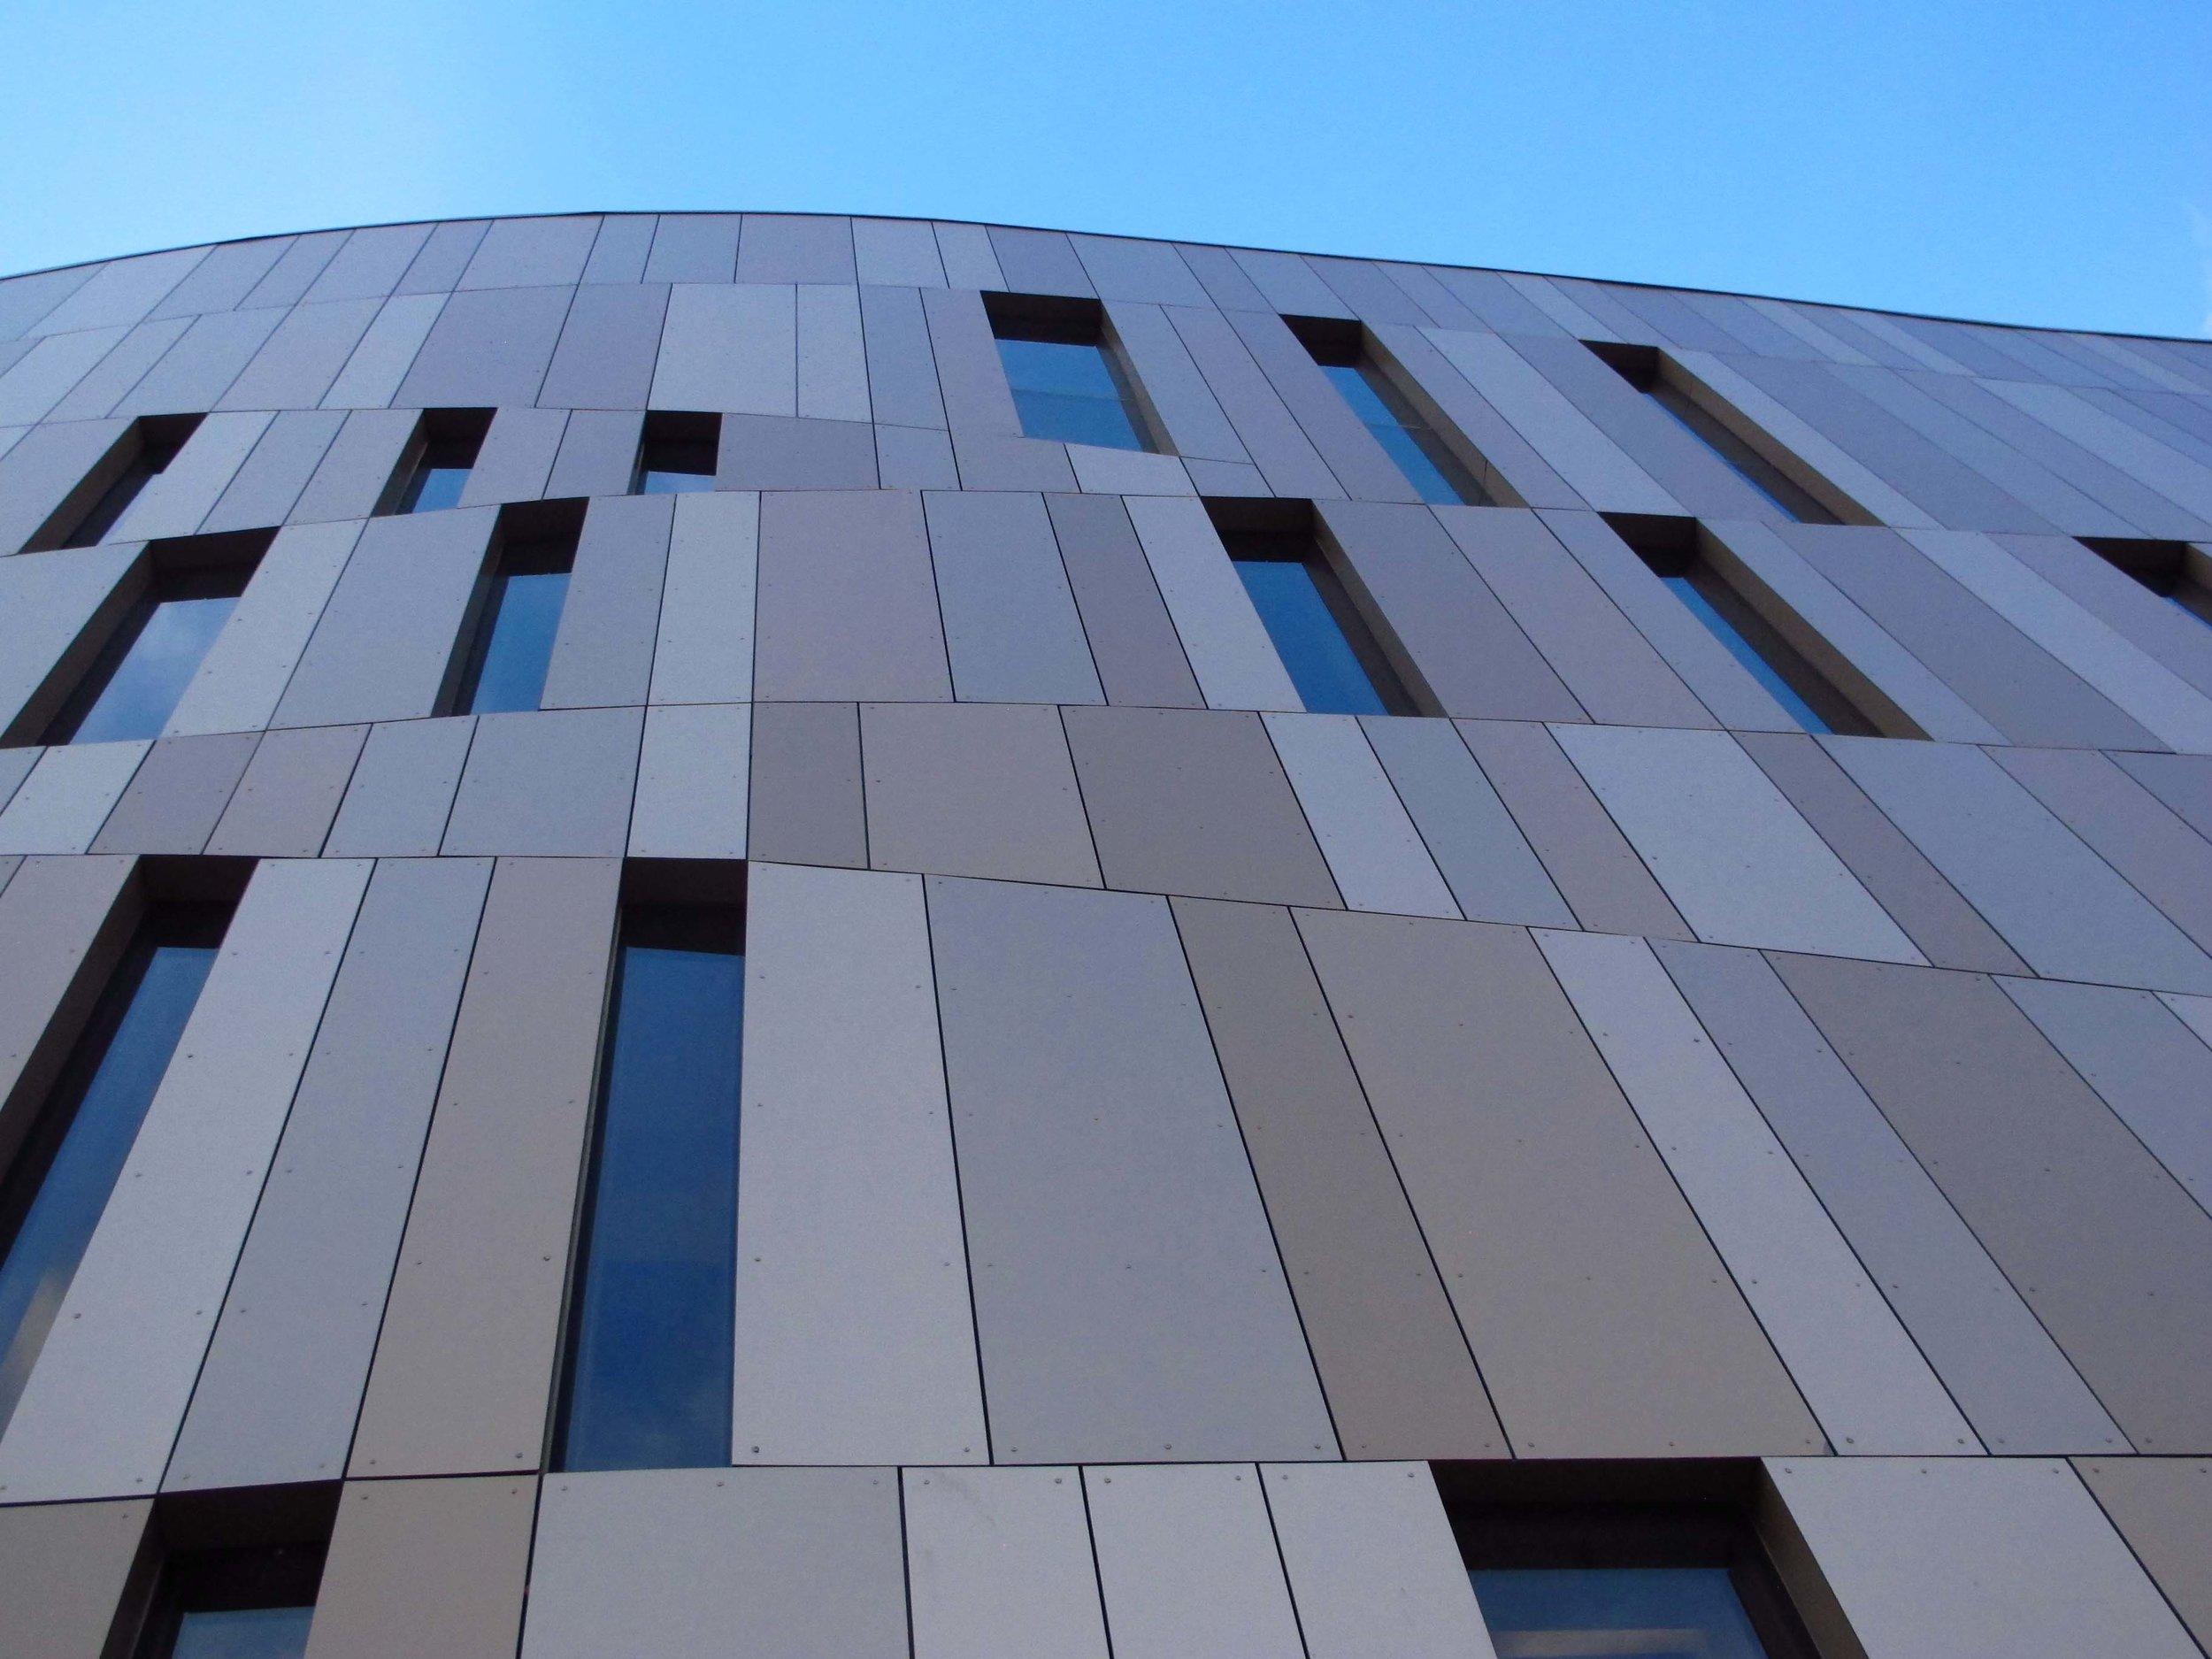 Center for Civil and Human Rights, Atlanta